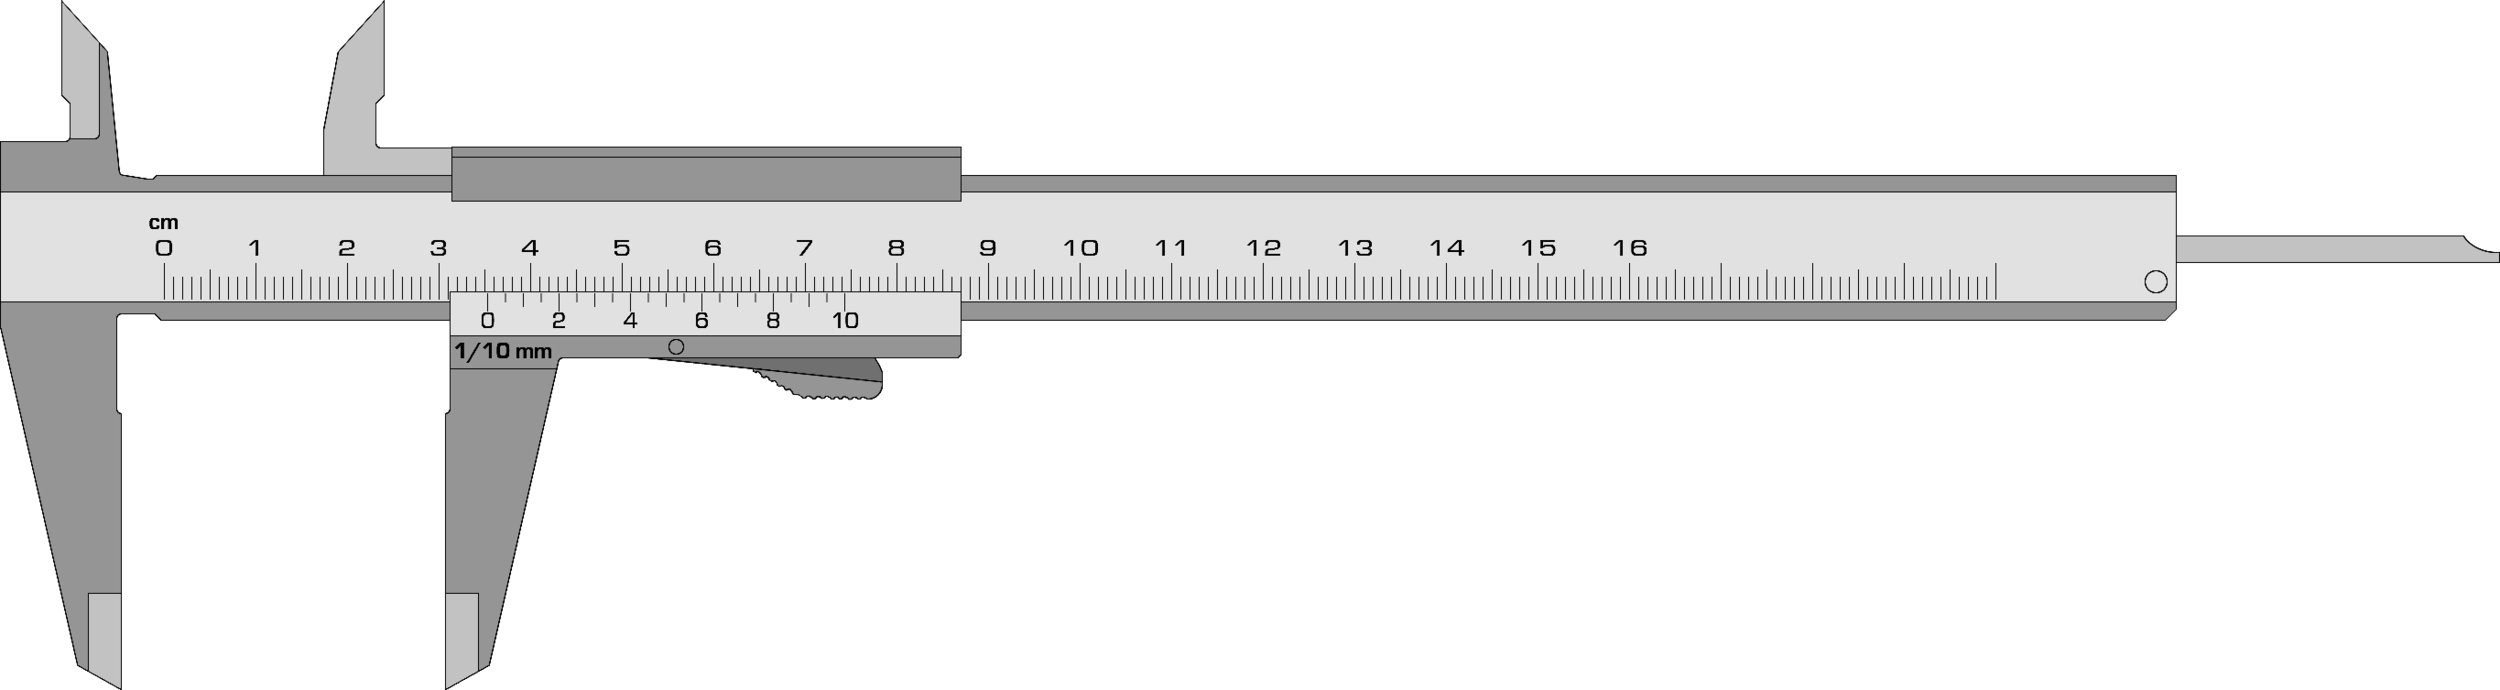 35.3 mm